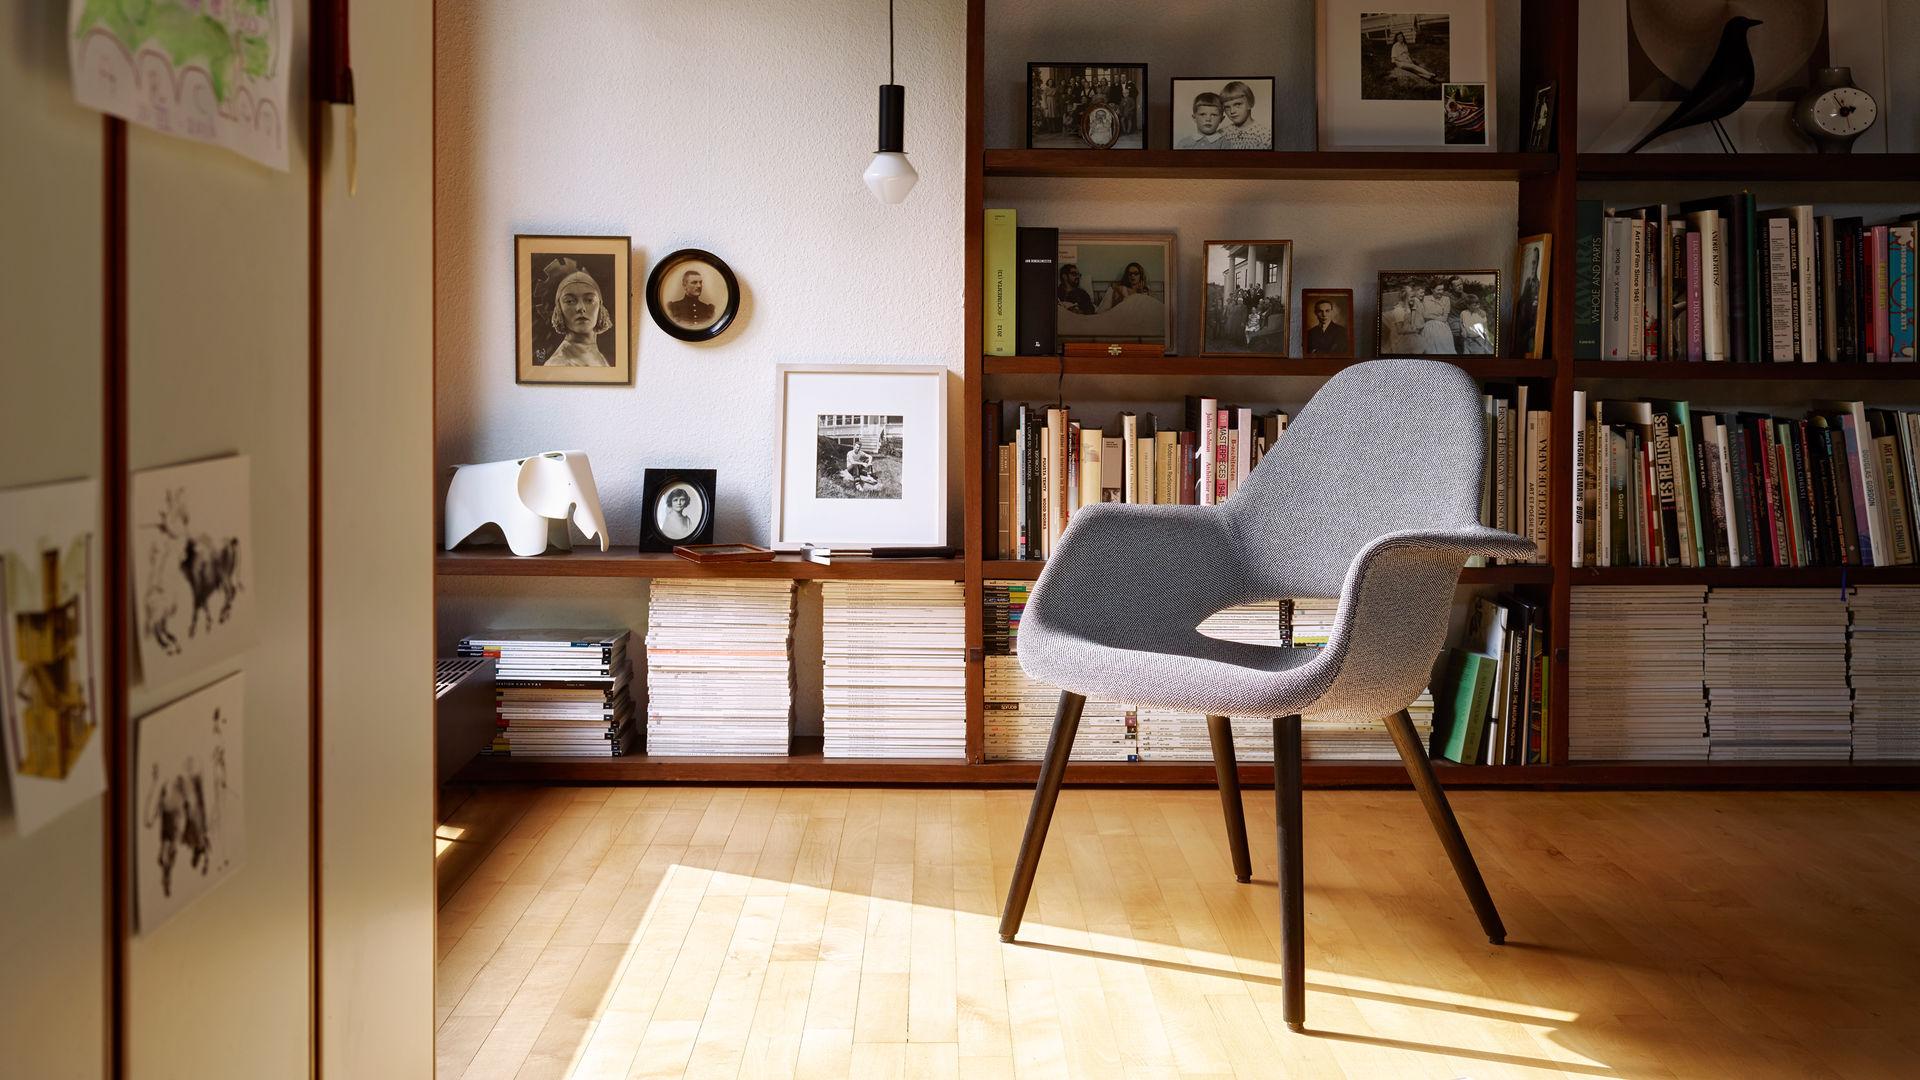 Organic Chair Ceramic Clock Eames House Bird black Eames Elephant (small)_web_16-9